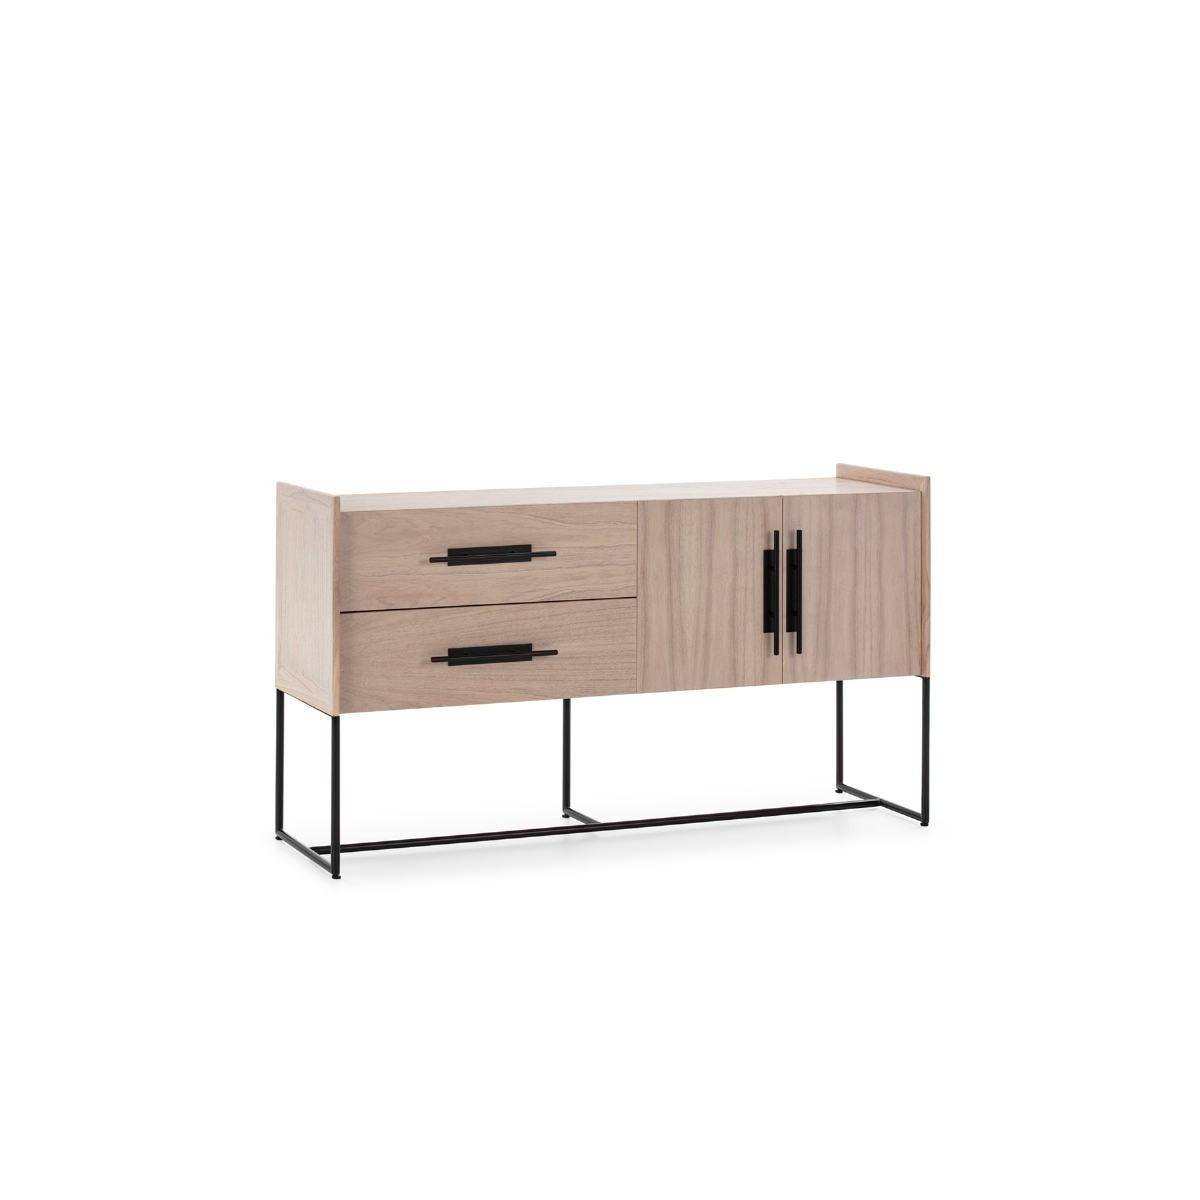 buffet 2 portes 2 tiroirs 150x46x86 bois naturel metal noir amp story 7950